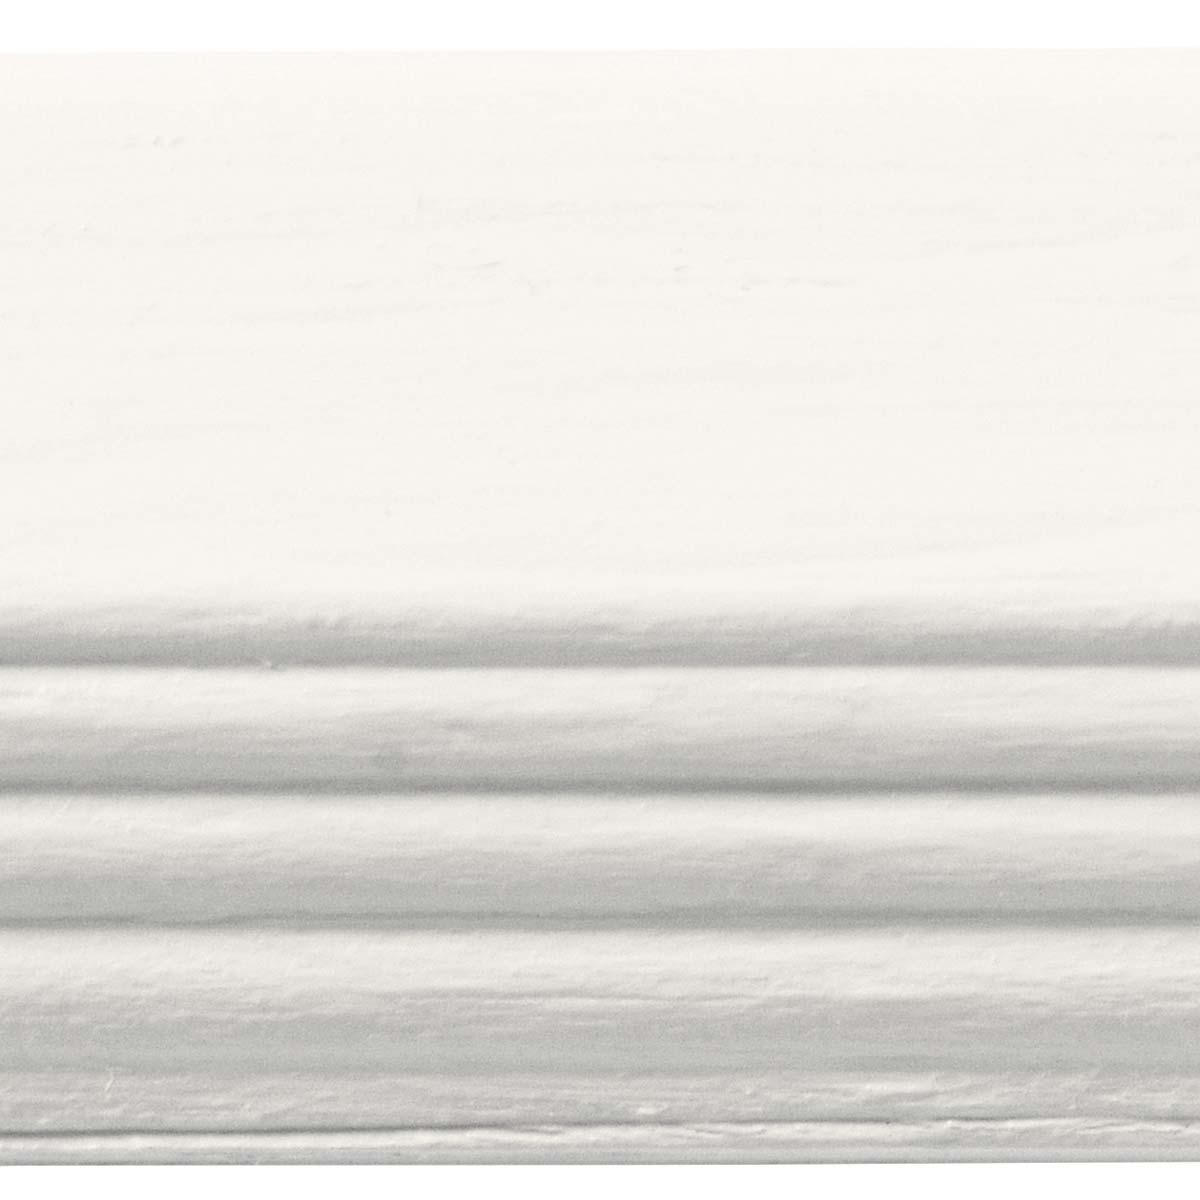 Waverly ® Inspirations Chalk Finish Acrylic Paint - Plaster, 16 oz. - 44863E